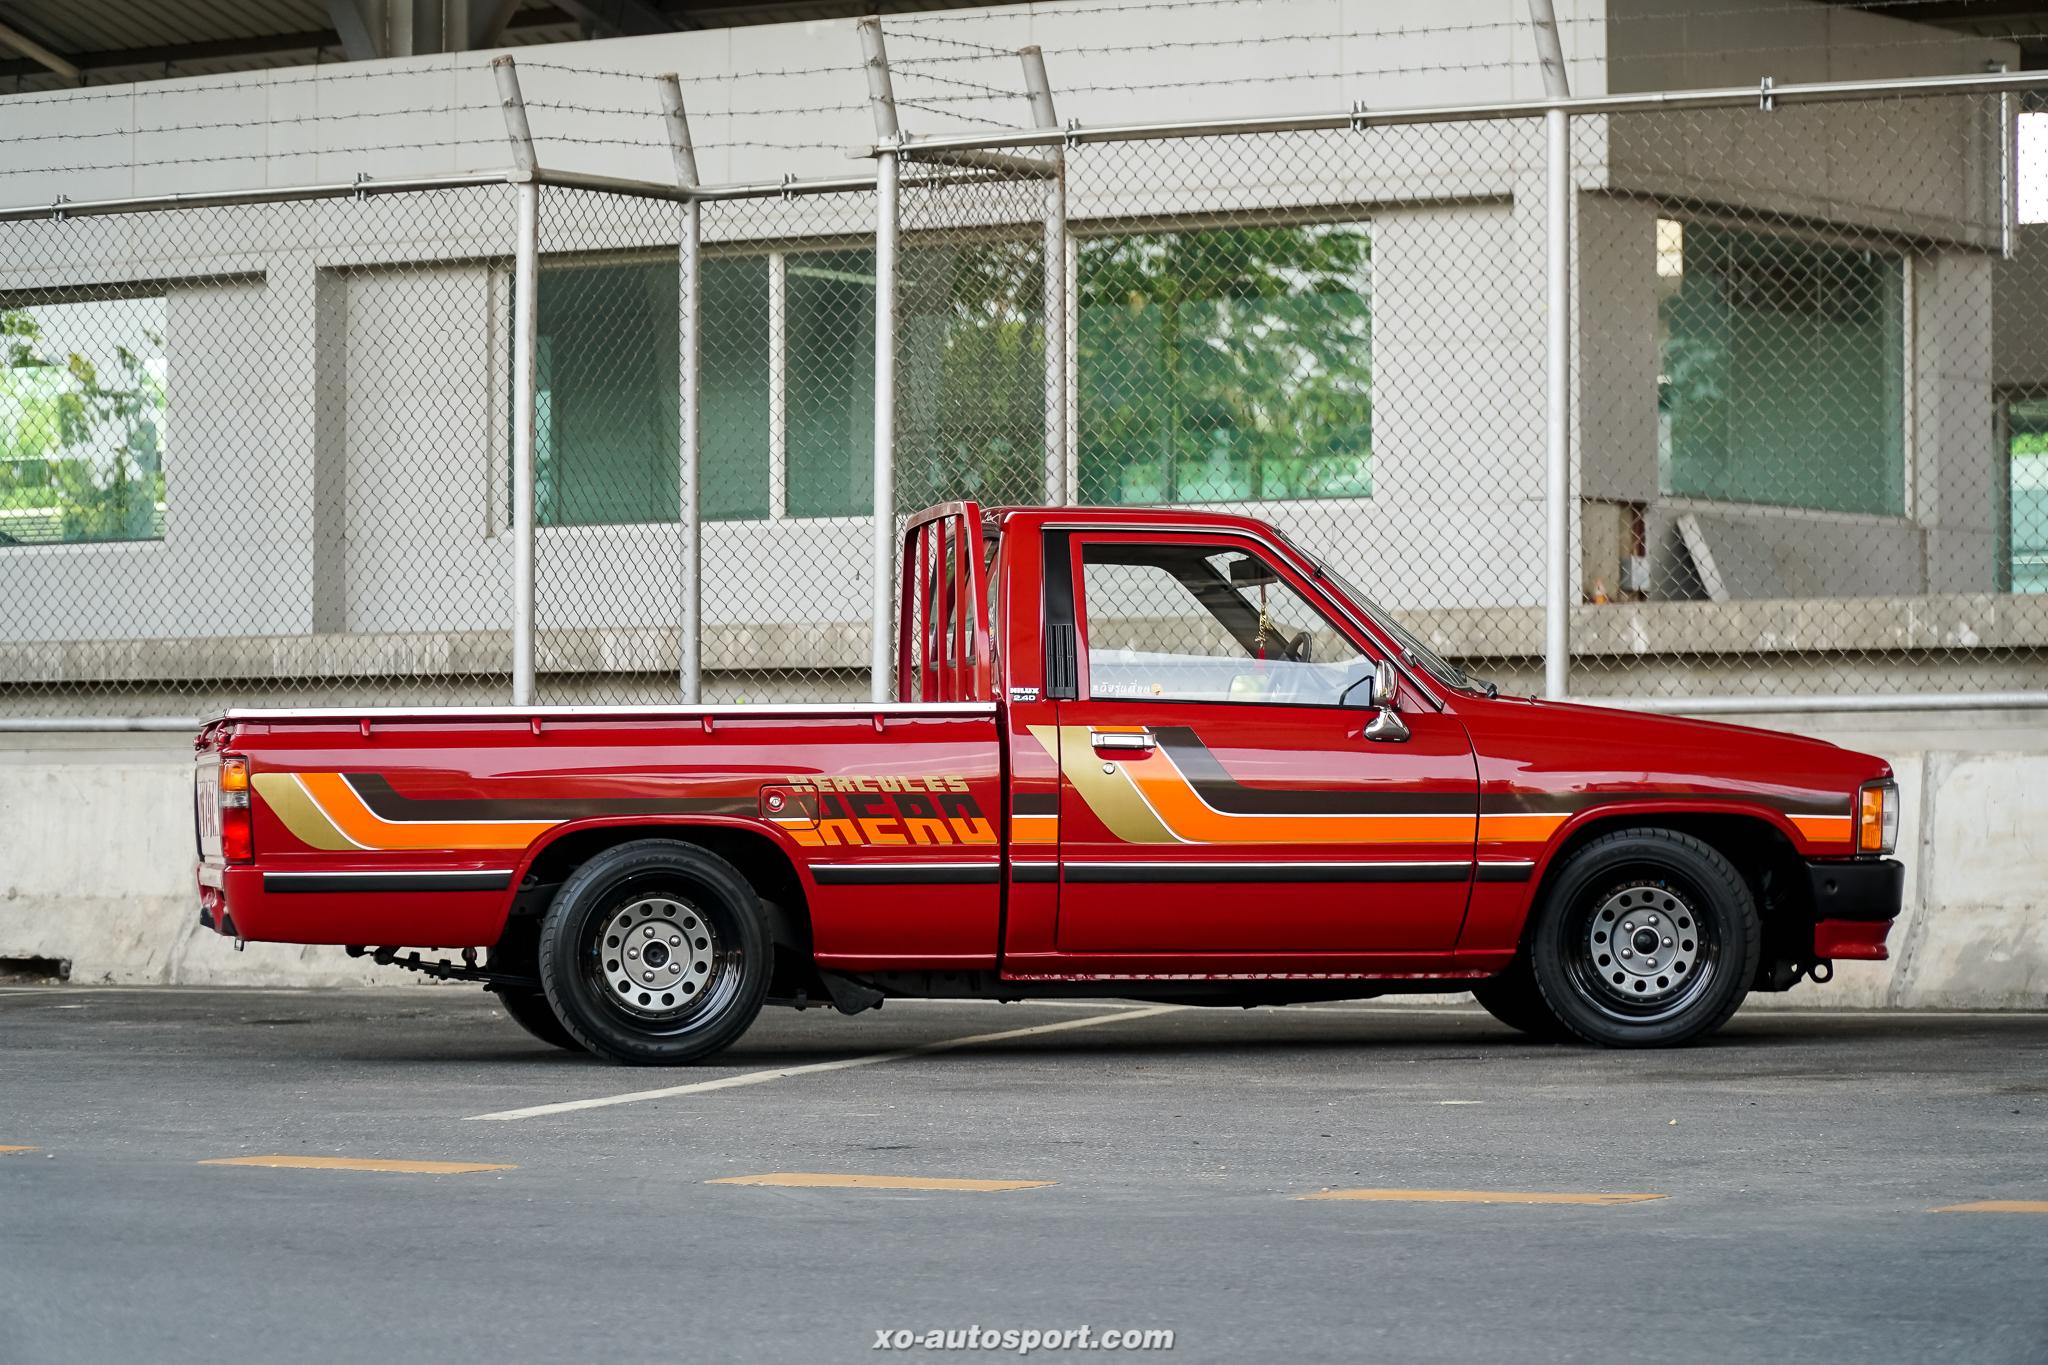 Short base truck 10